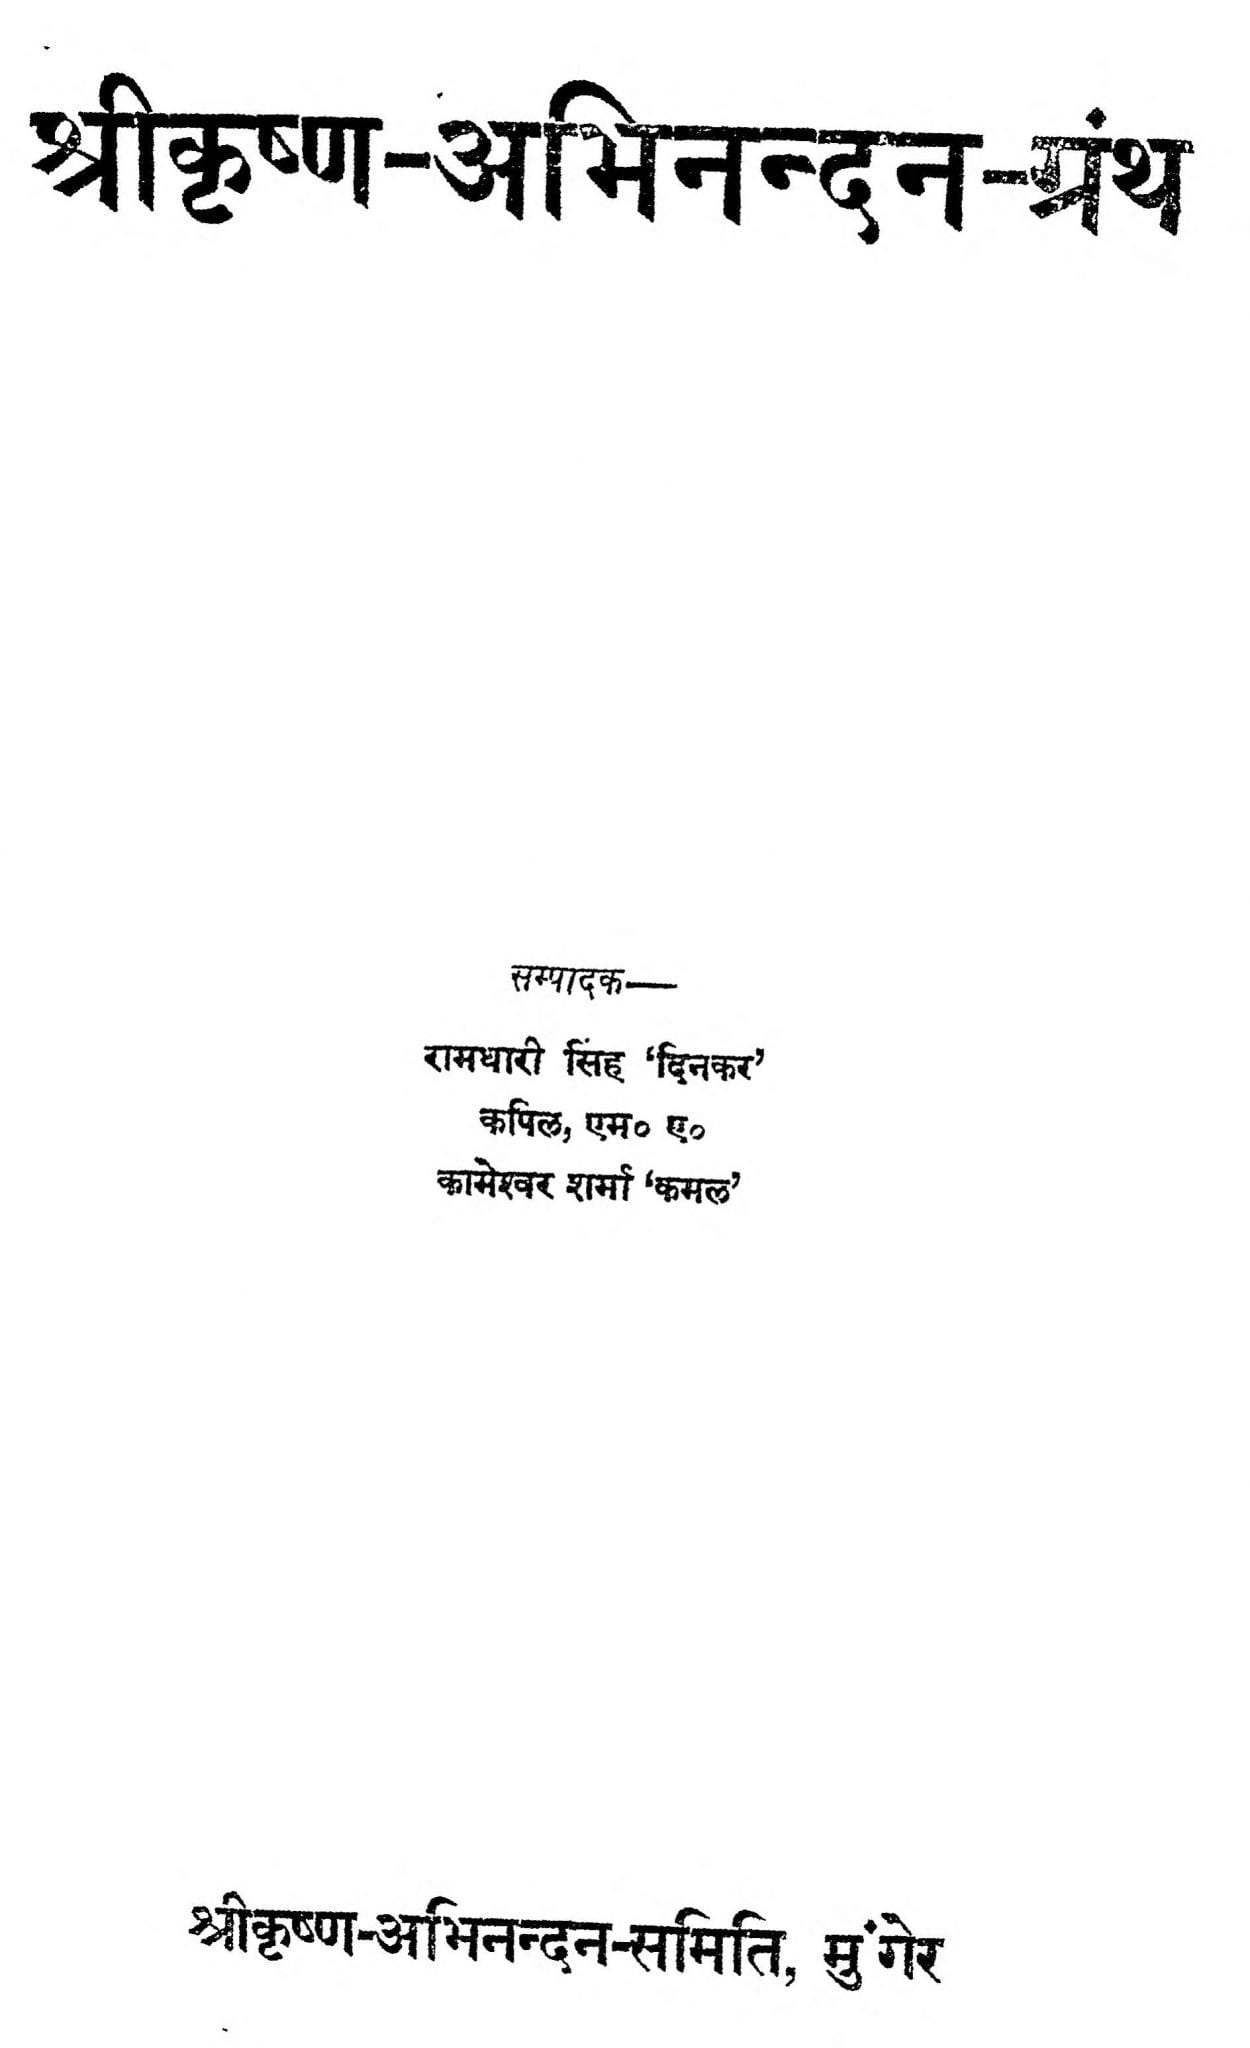 Book Image : श्रीकृष्ण - अभिनन्दन - ग्रन्थ - Shri Krishan Abhinandan Granth